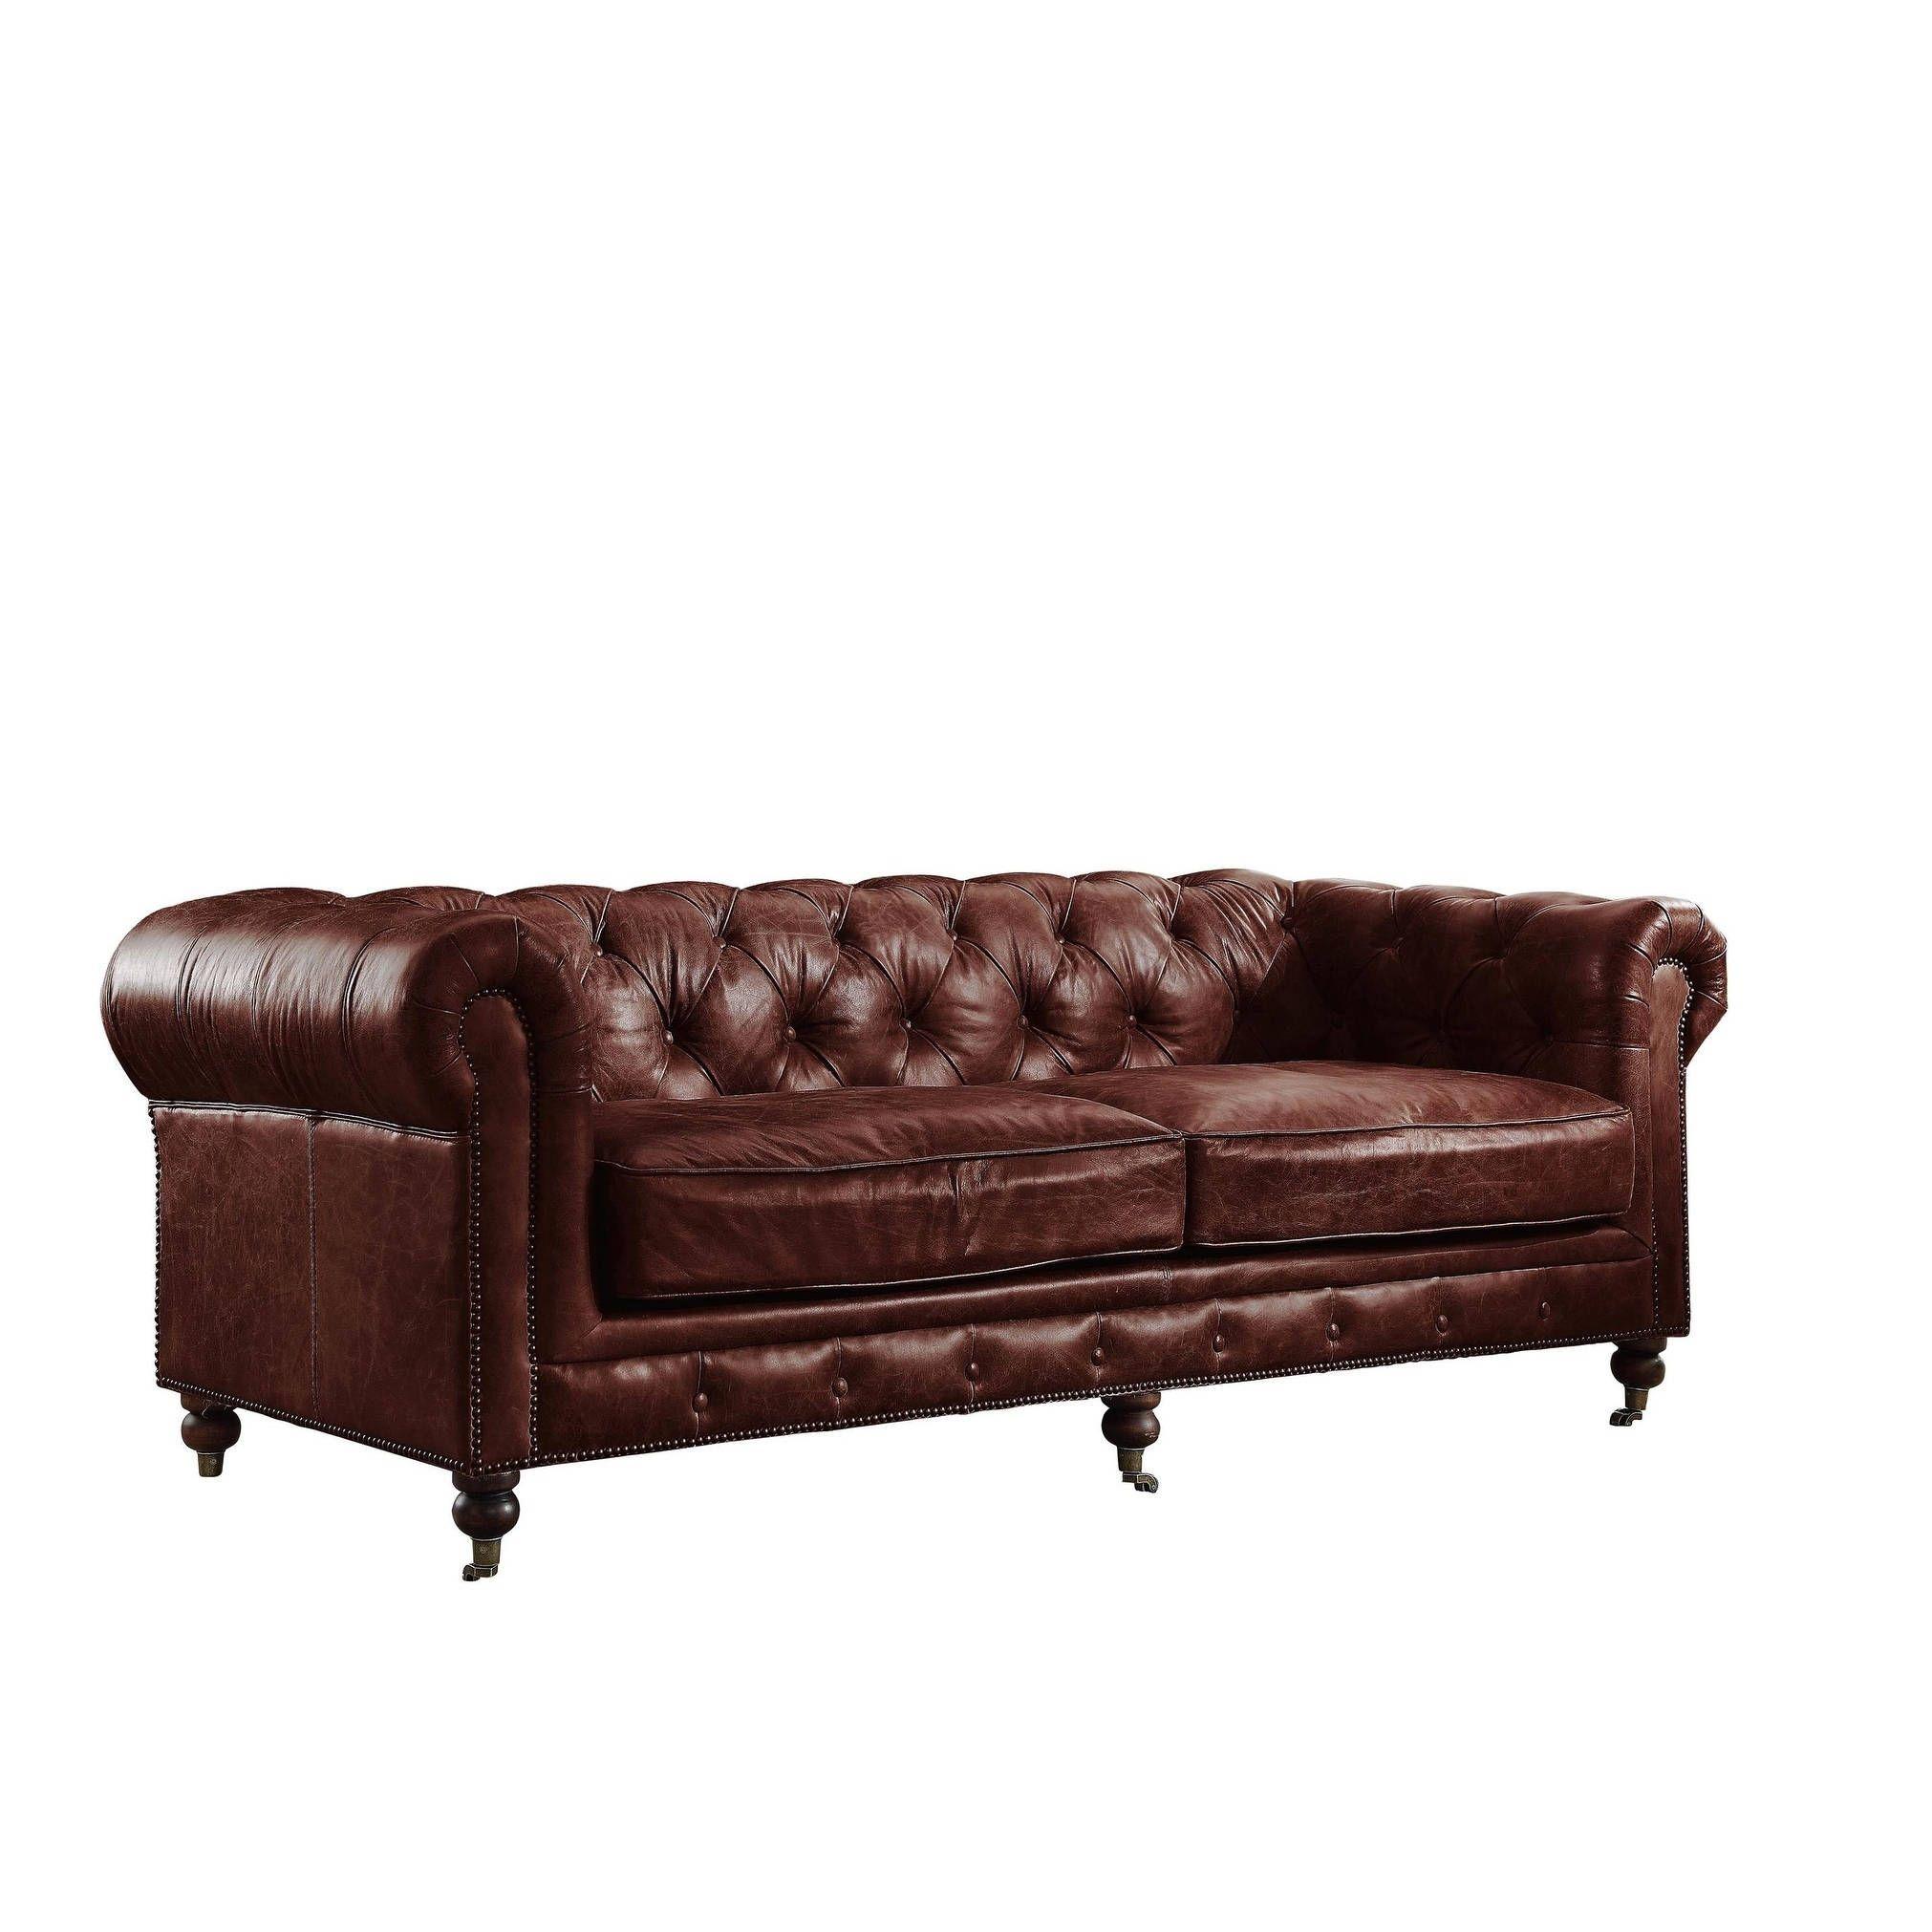 Acme Furniture Aberdeen Vintage Dark Brown Top Grain Leather Sofa